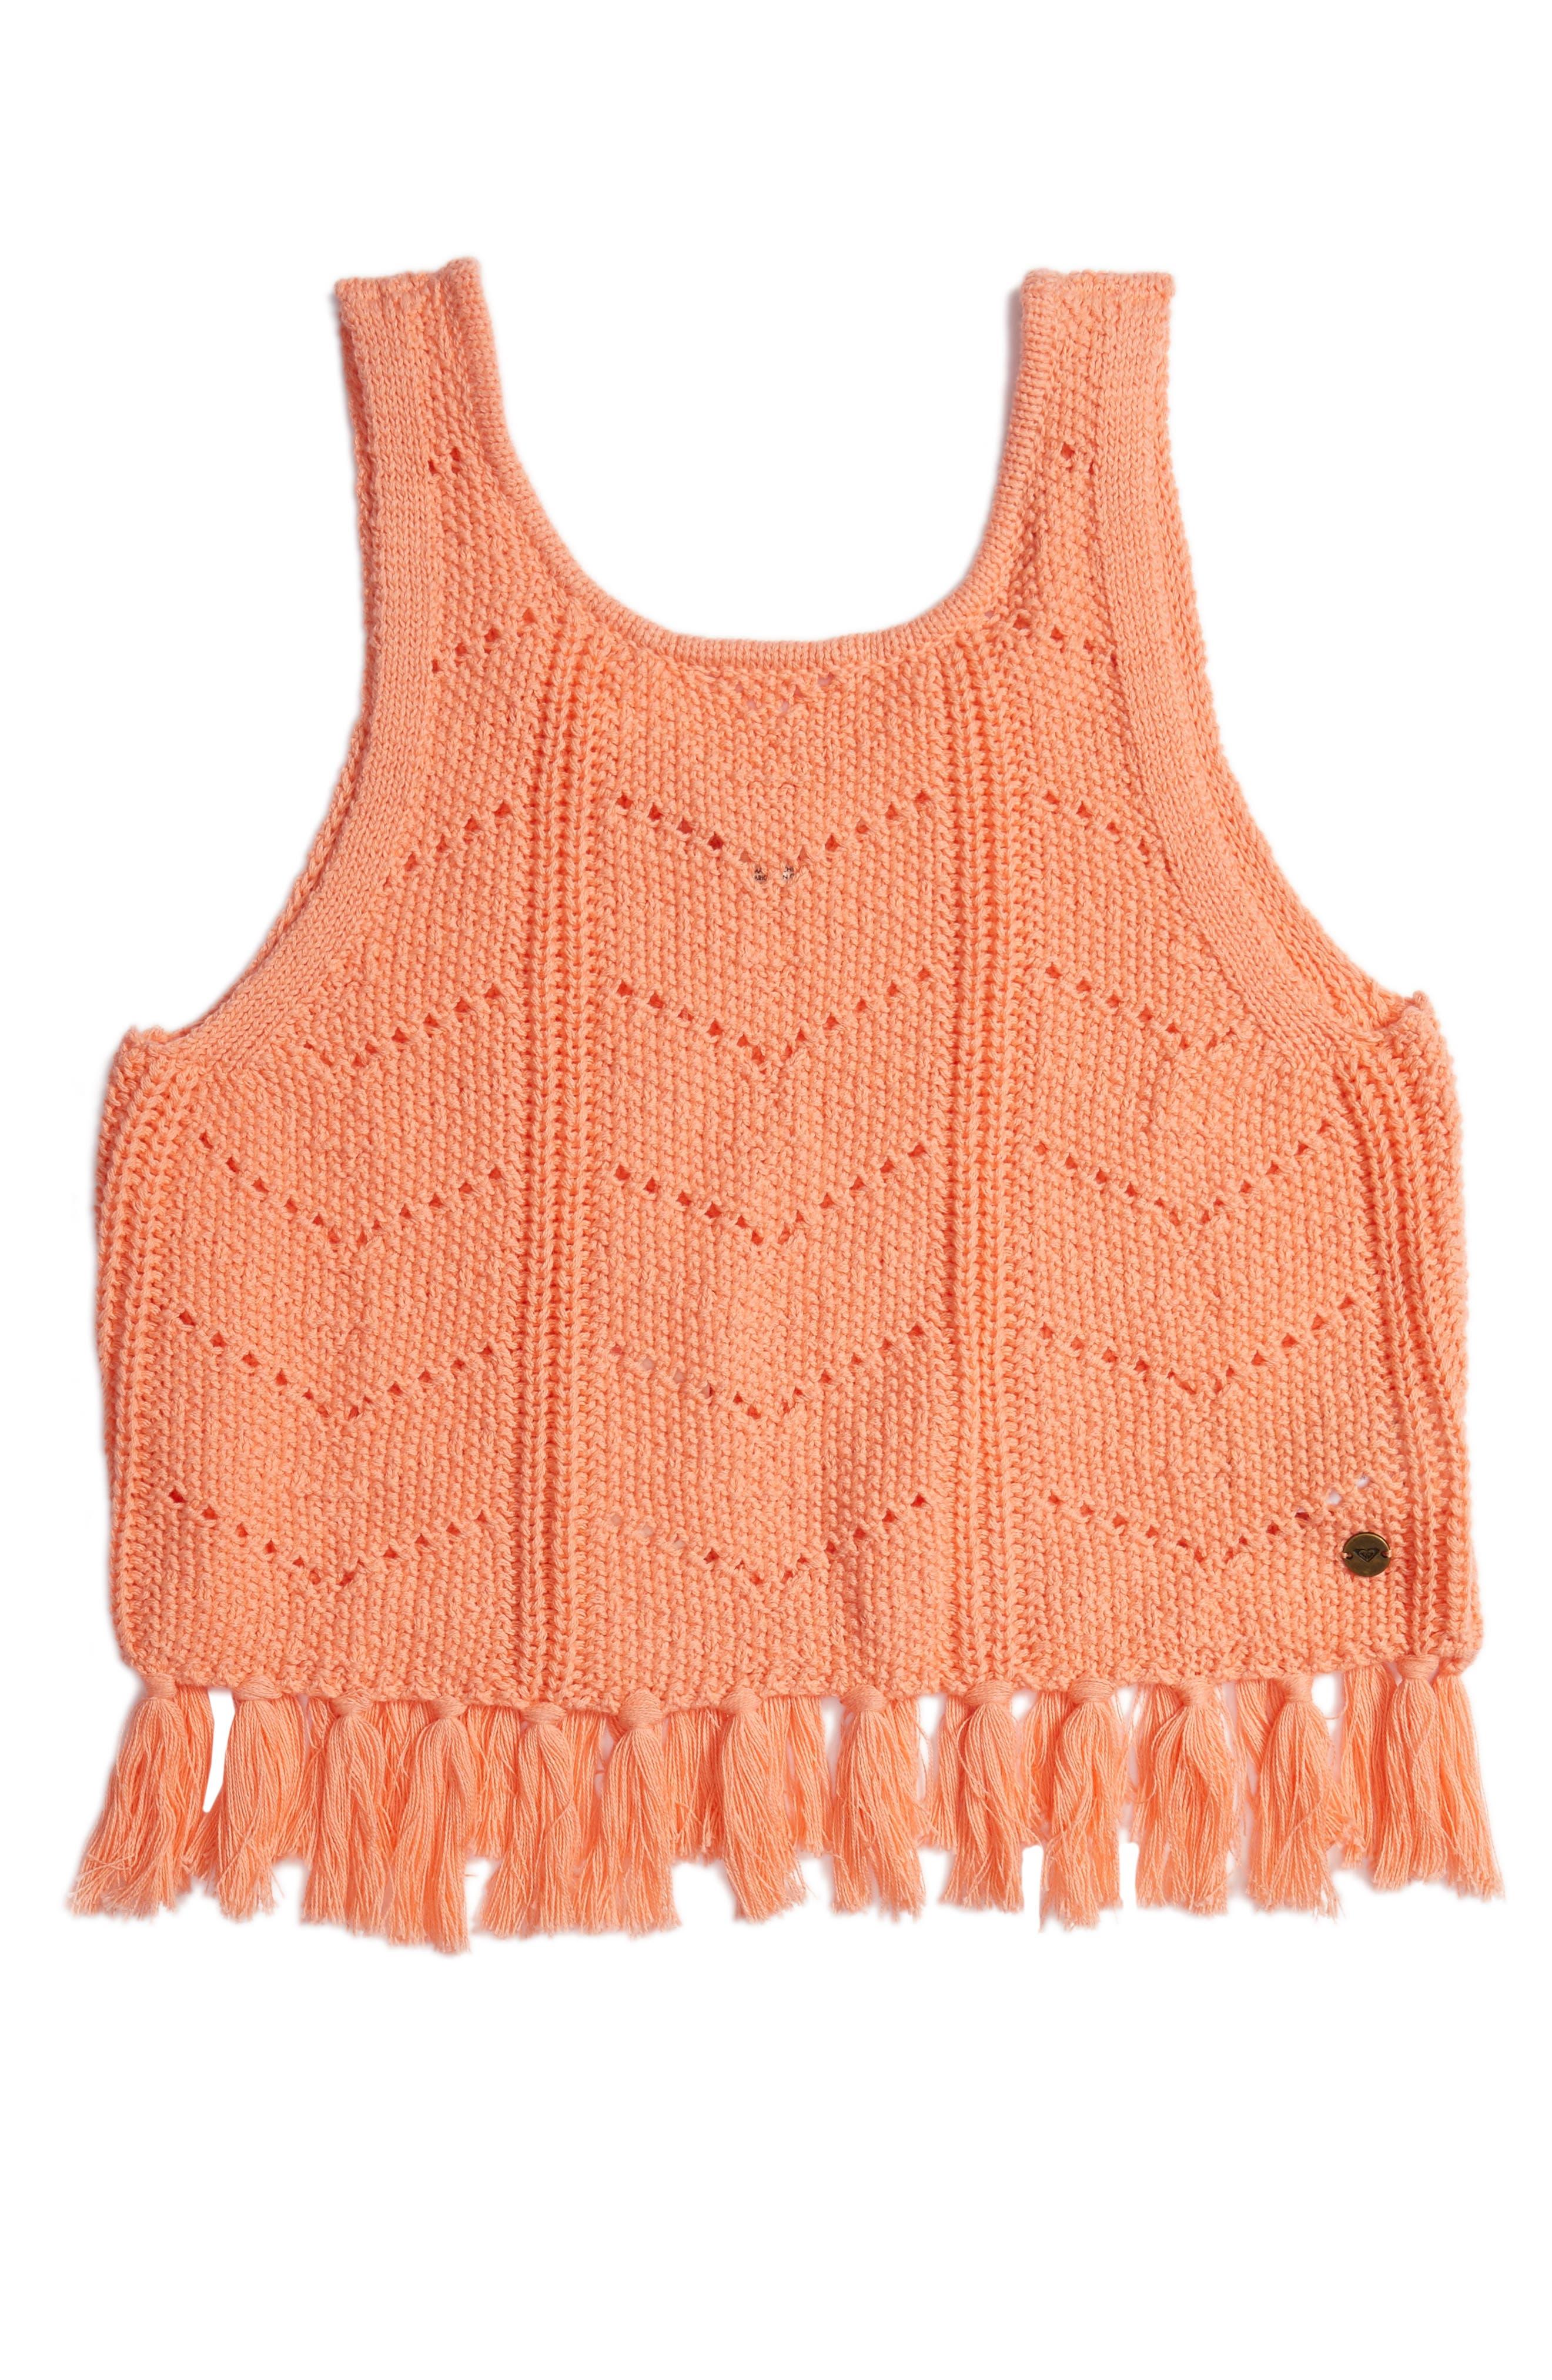 Set Them Free Knit Tassel Tank,                             Main thumbnail 1, color,                             Desert Flower